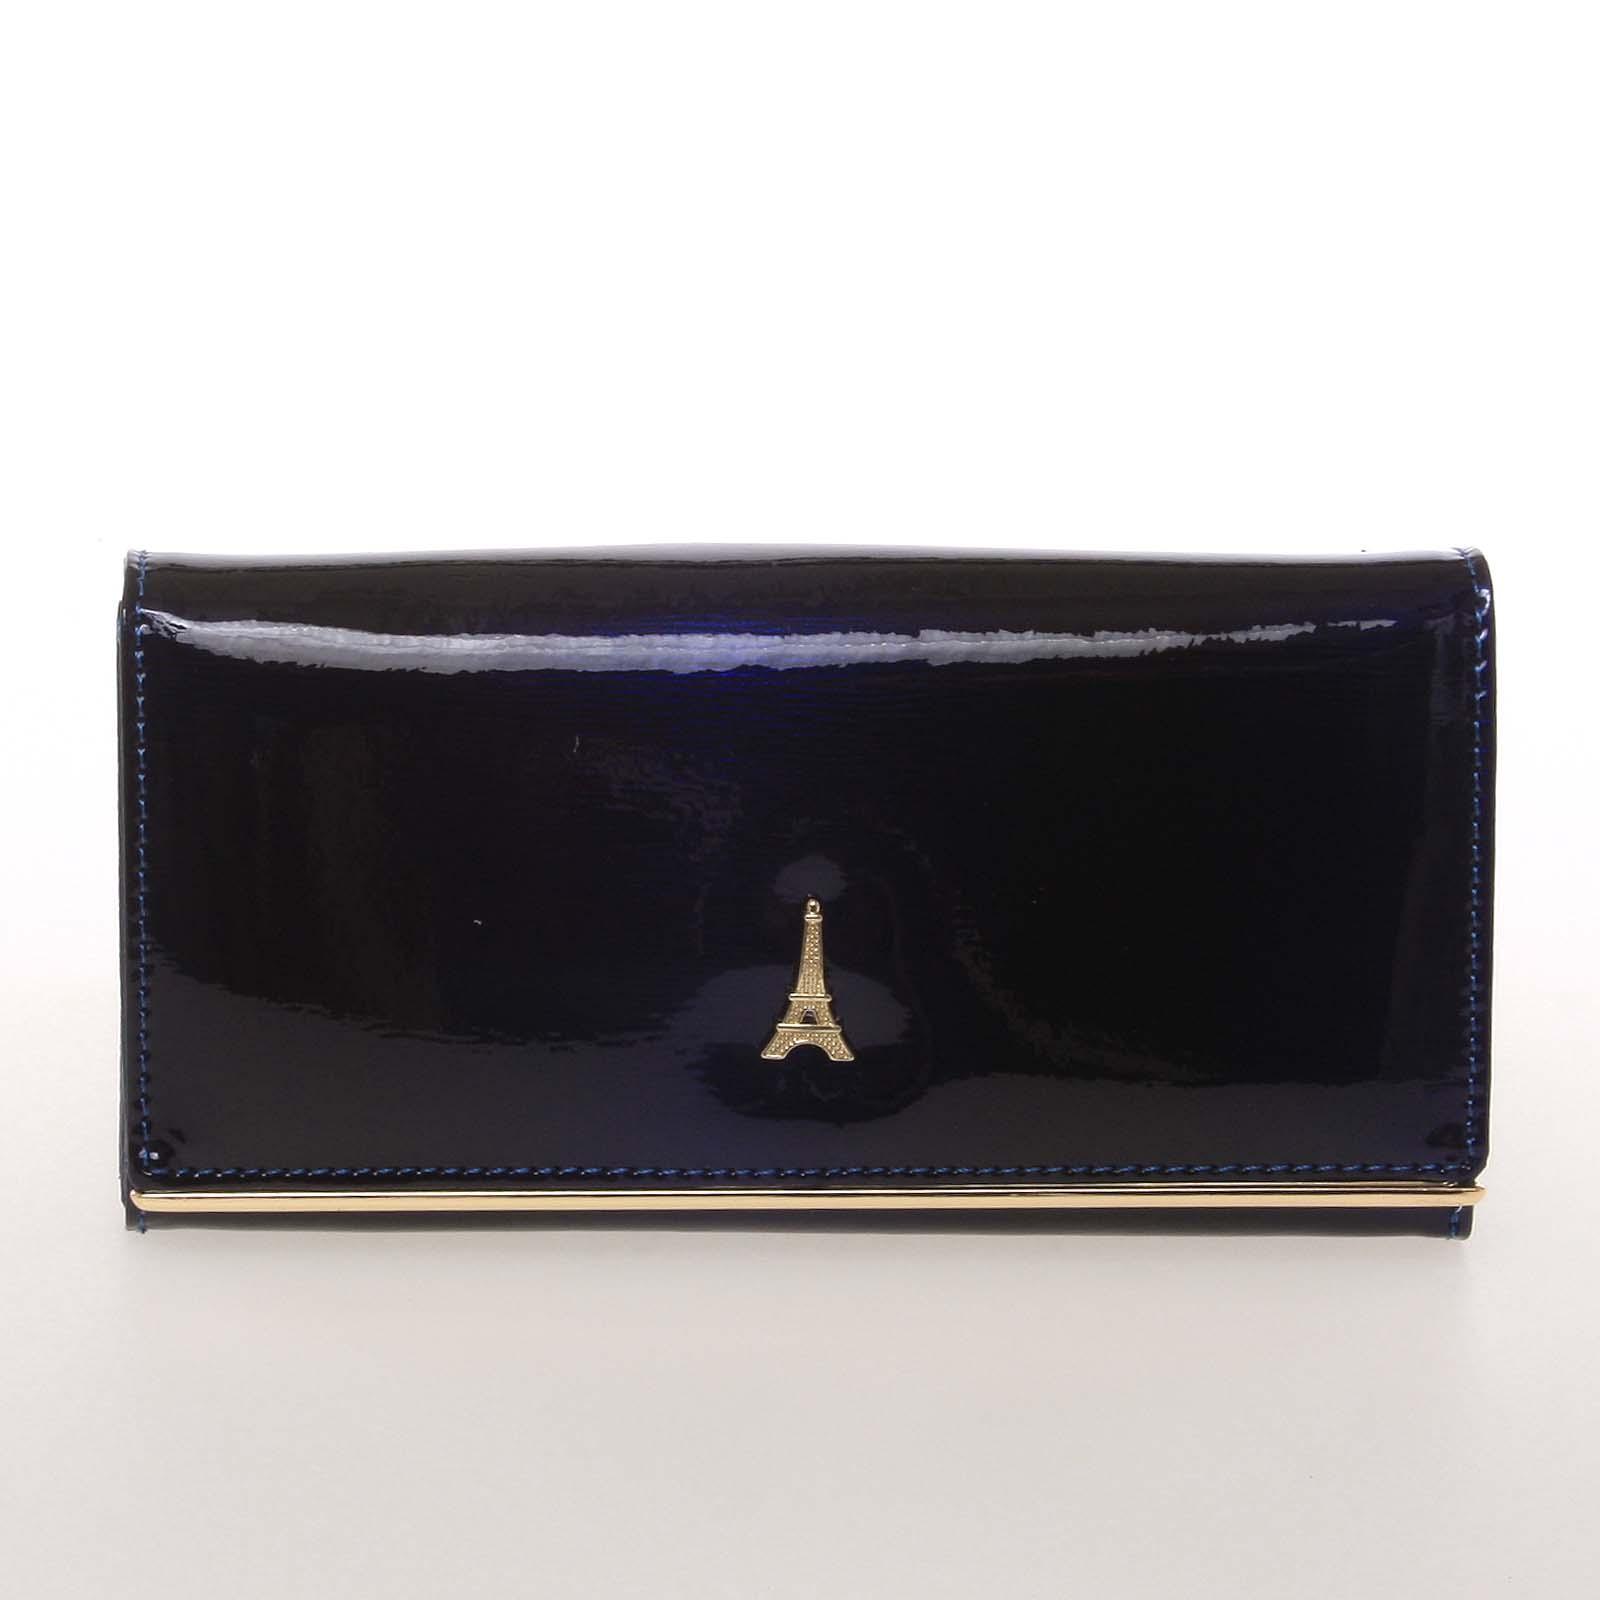 Jedinečná kožená lakovaná dámska peňaženka modrá - PARIS 64003DSHK